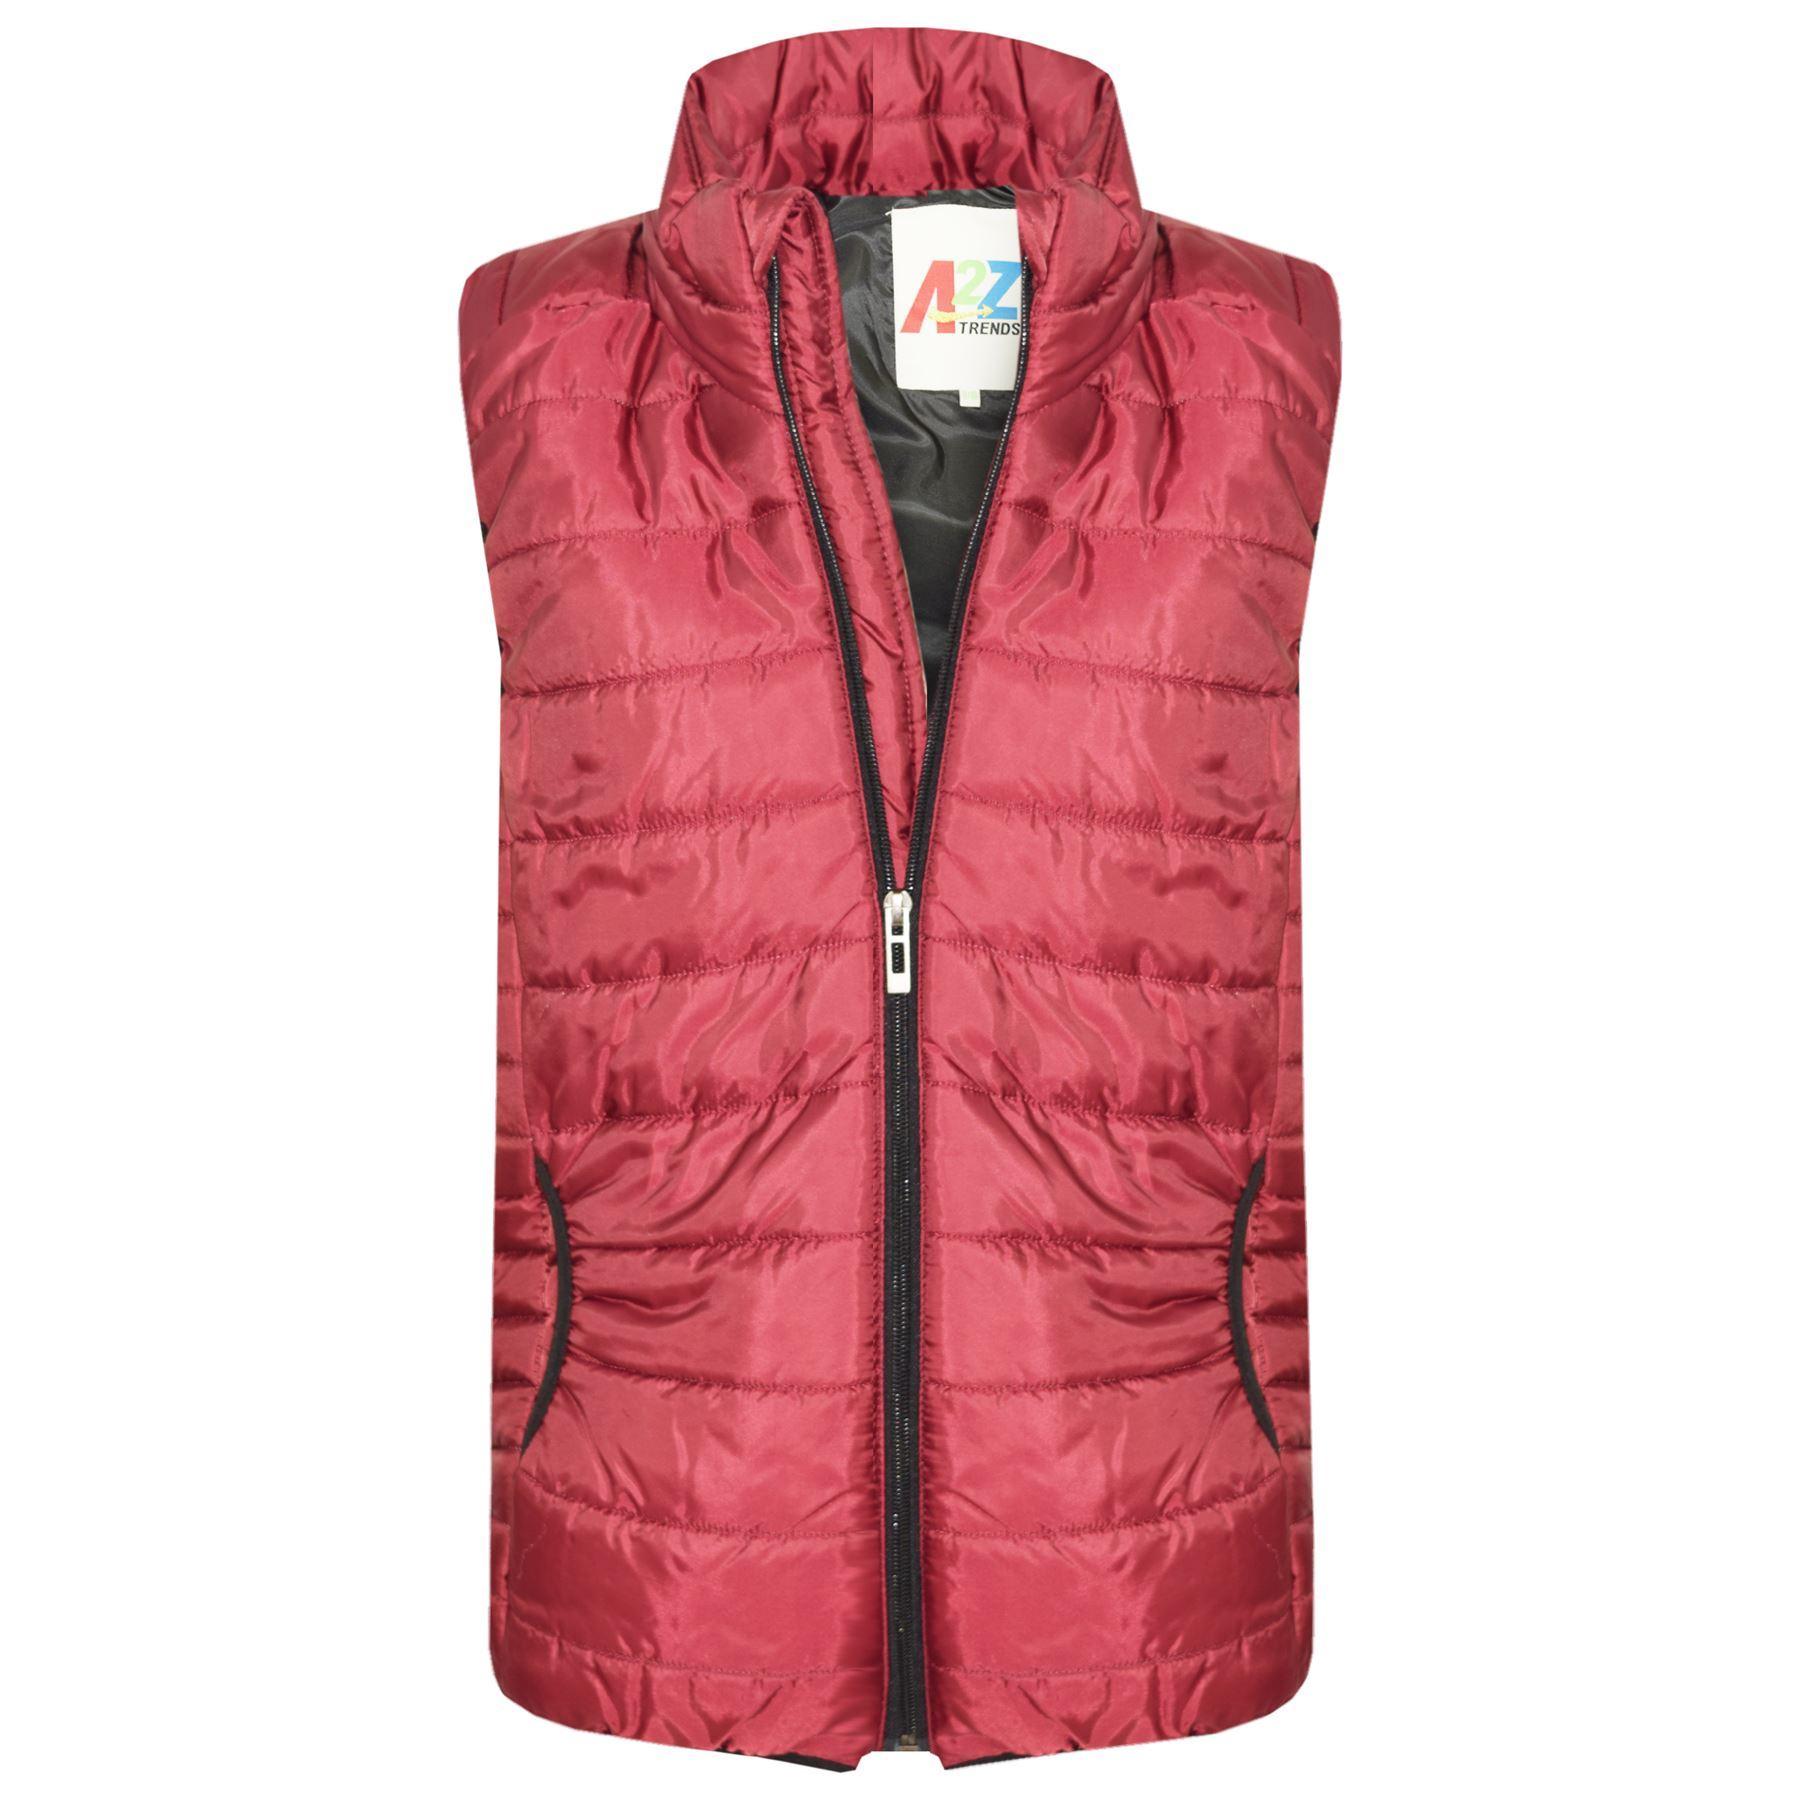 Kids Girls Boys Wine Sleeveless High Neck Padded Gilet Bodywarmer Jackets 5-13Yr